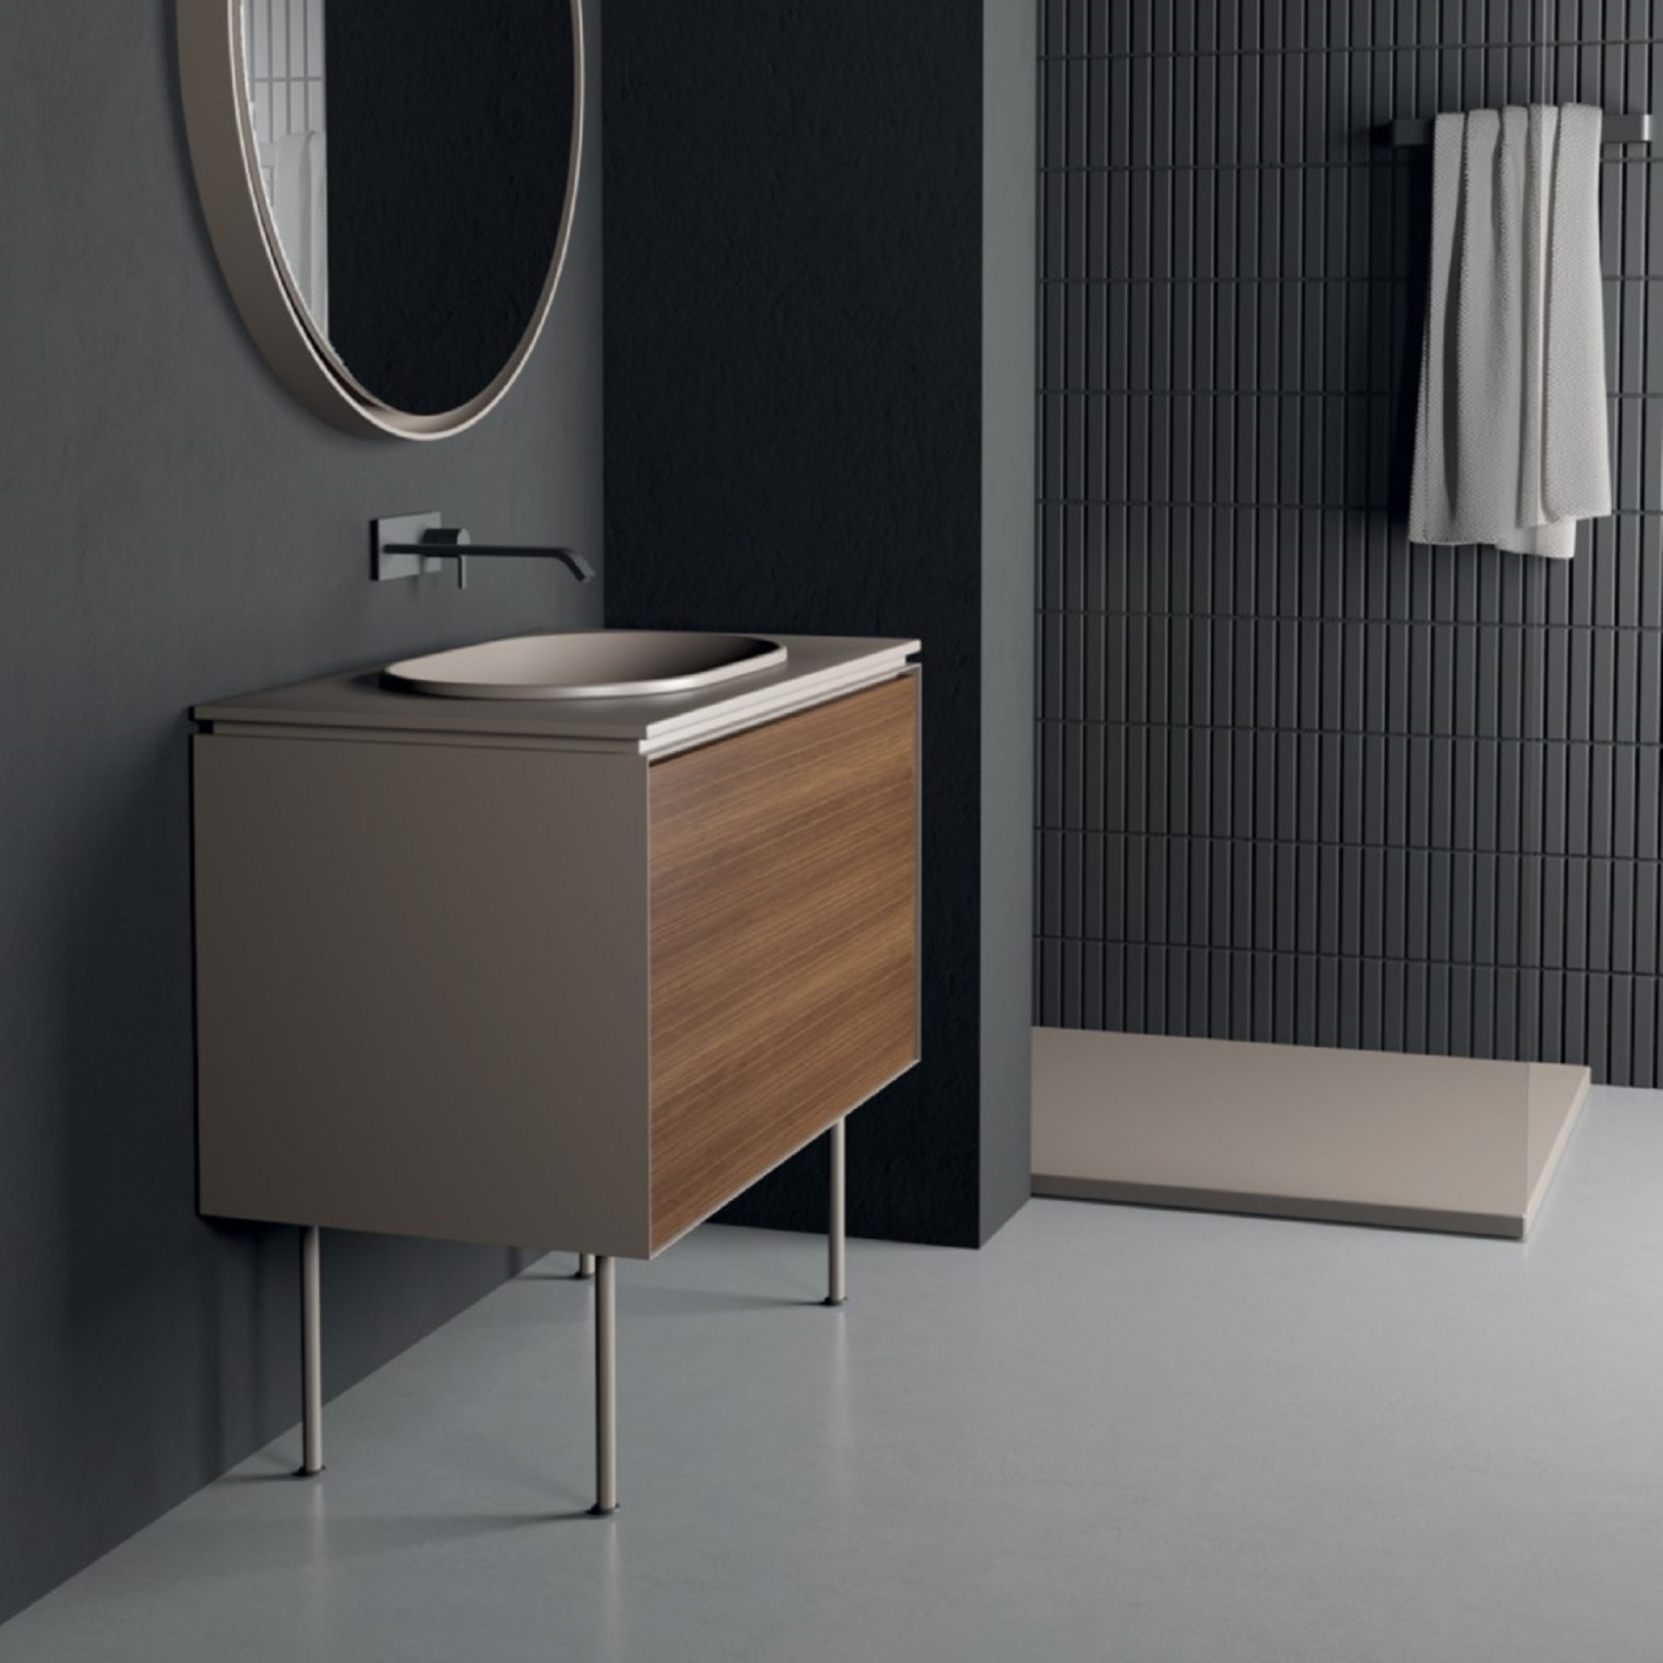 Nic Design Lama 90 Bathroom Cabinet Tattahome